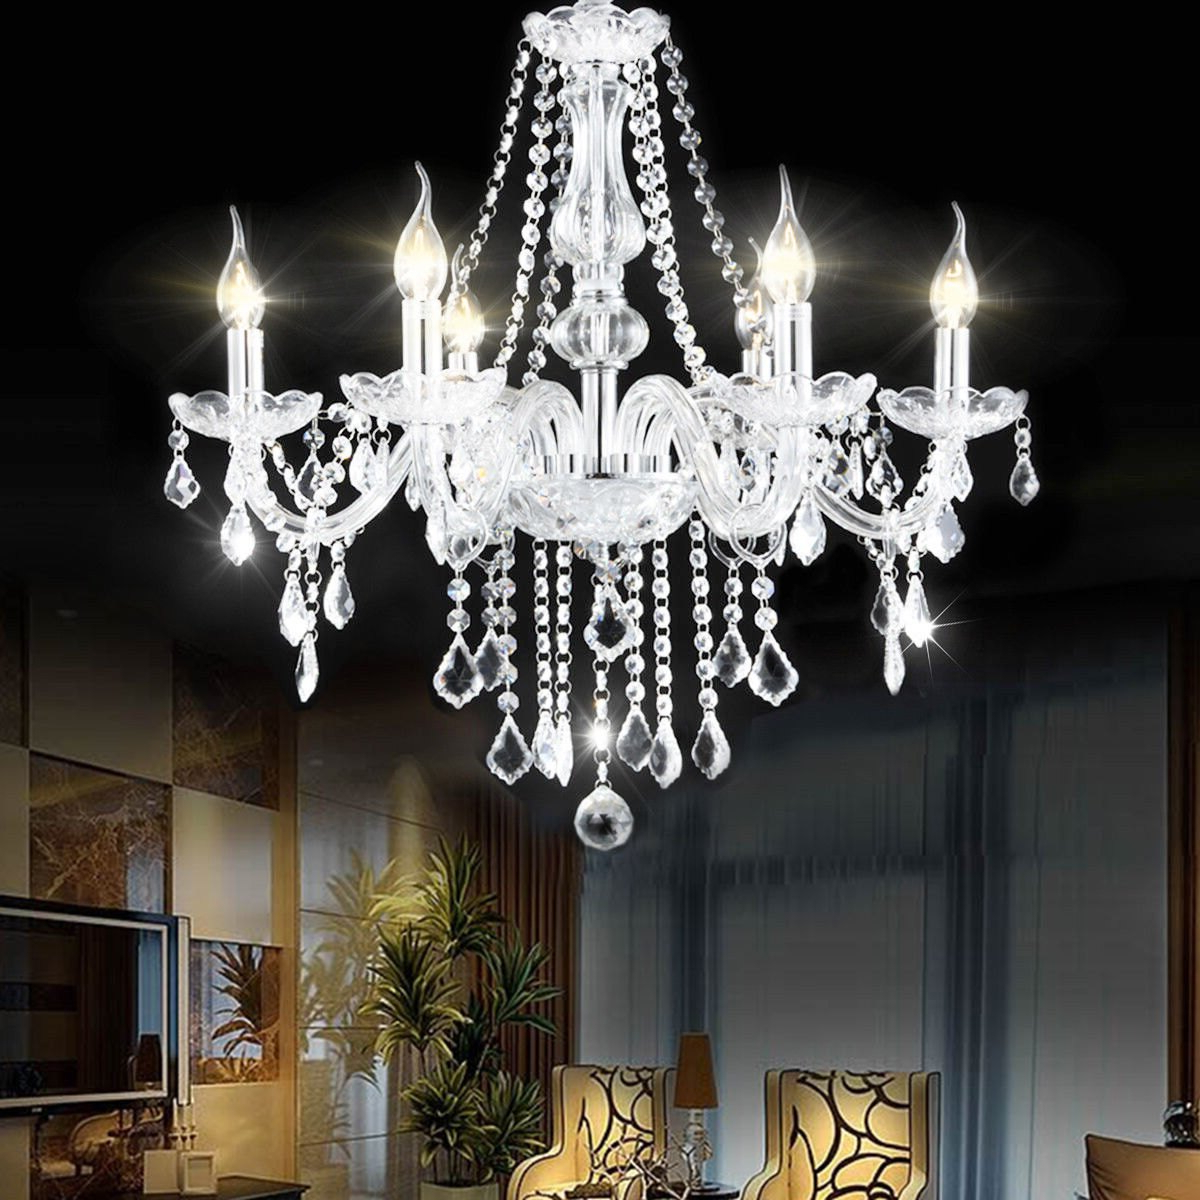 Popular Costway Elegant Crystal Chandelier Modern 6 Ceiling Light Lamp Pendant  Fixture Lighting Pertaining To Dailey 4 Light Drum Chandeliers (View 24 of 25)